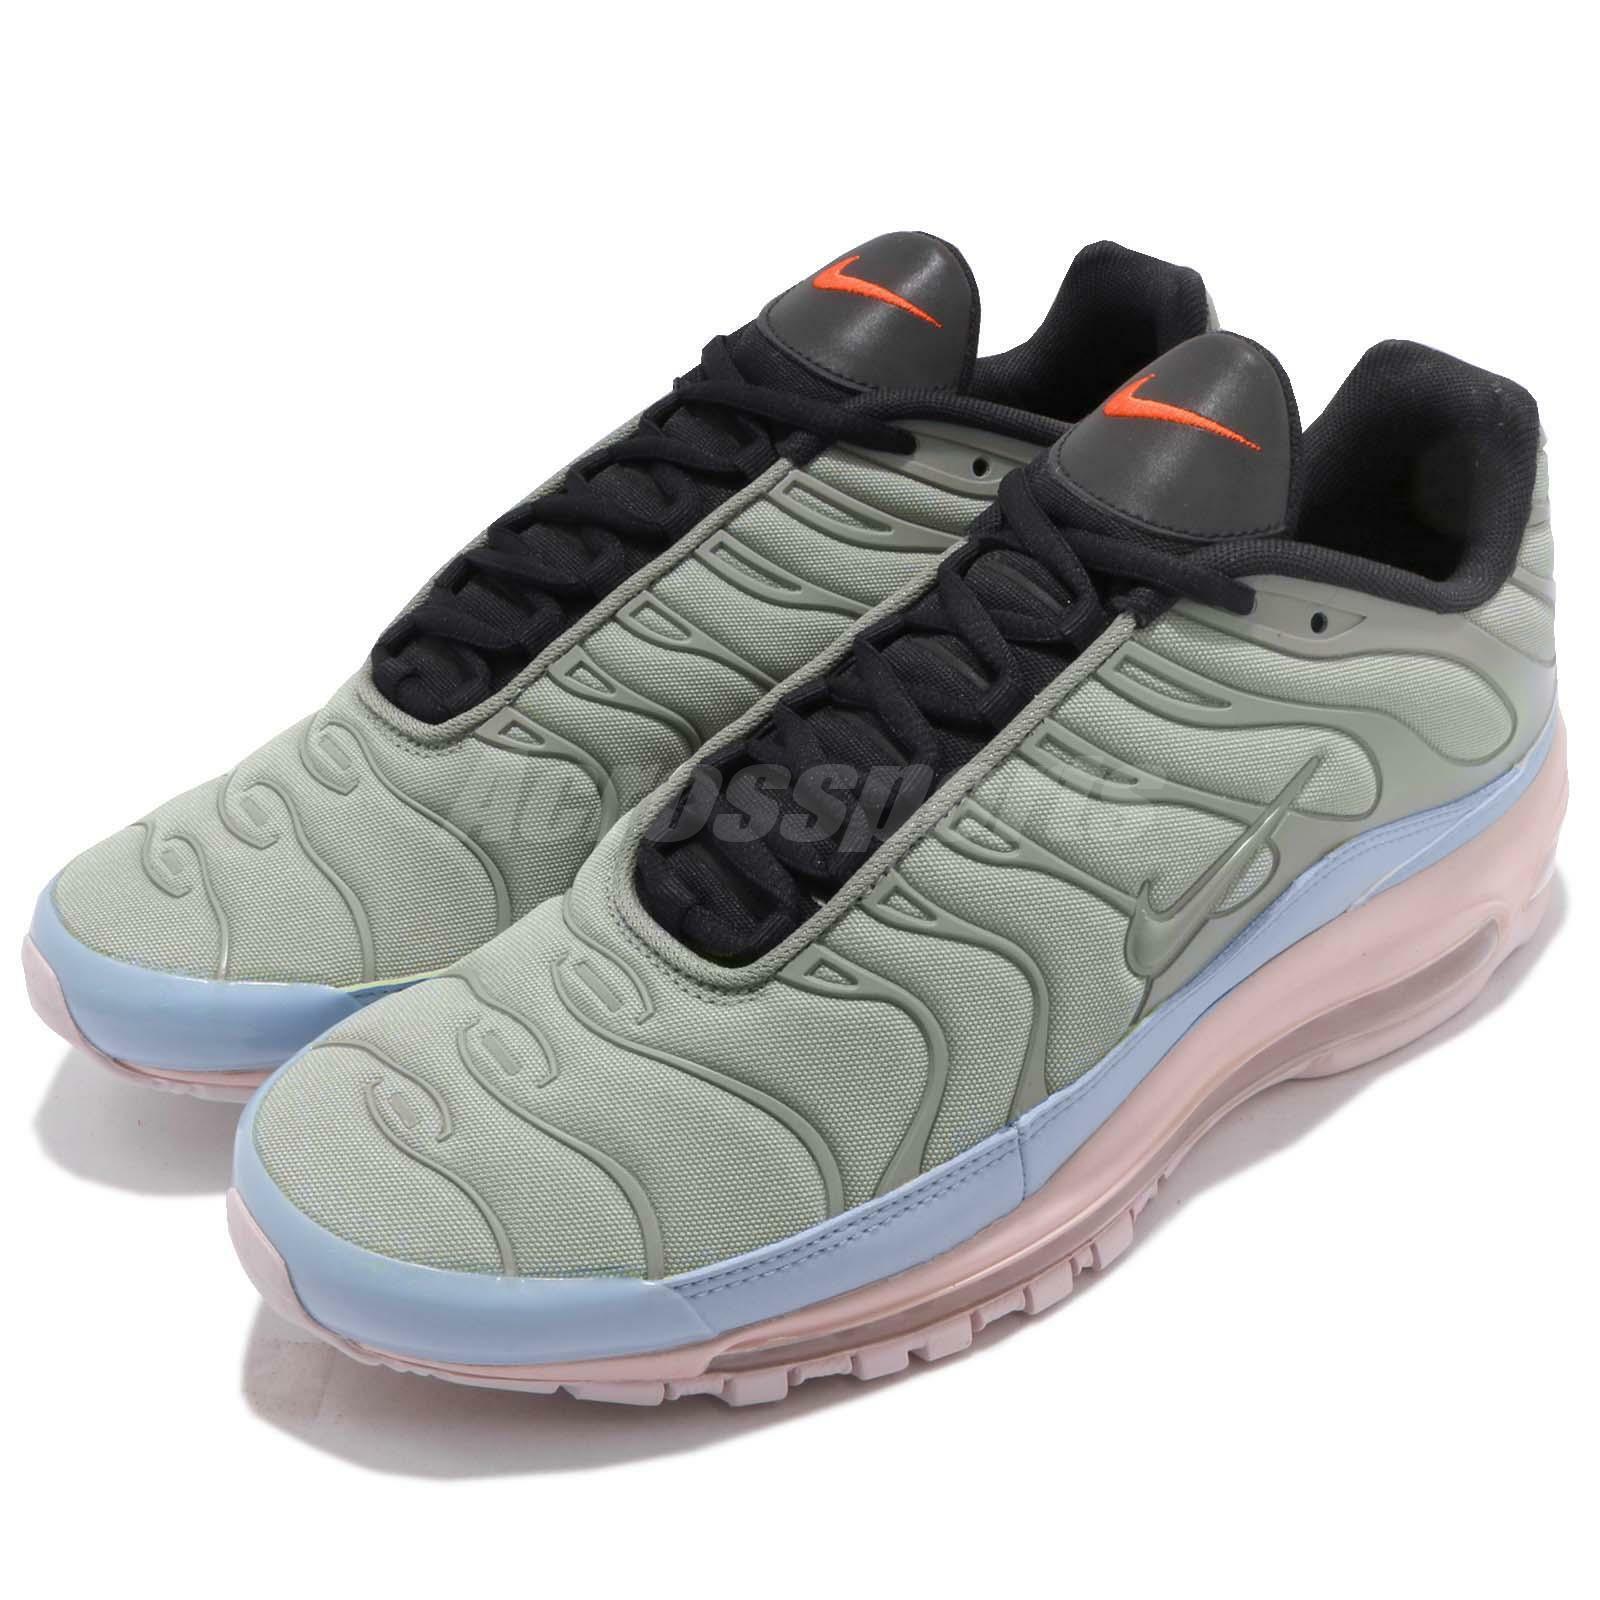 Nike Nike Nike Air Max Plus 97   97 Plus Tune Up Hybrid Men Running scarpe scarpe da ginnastica Pick 1 dae87f